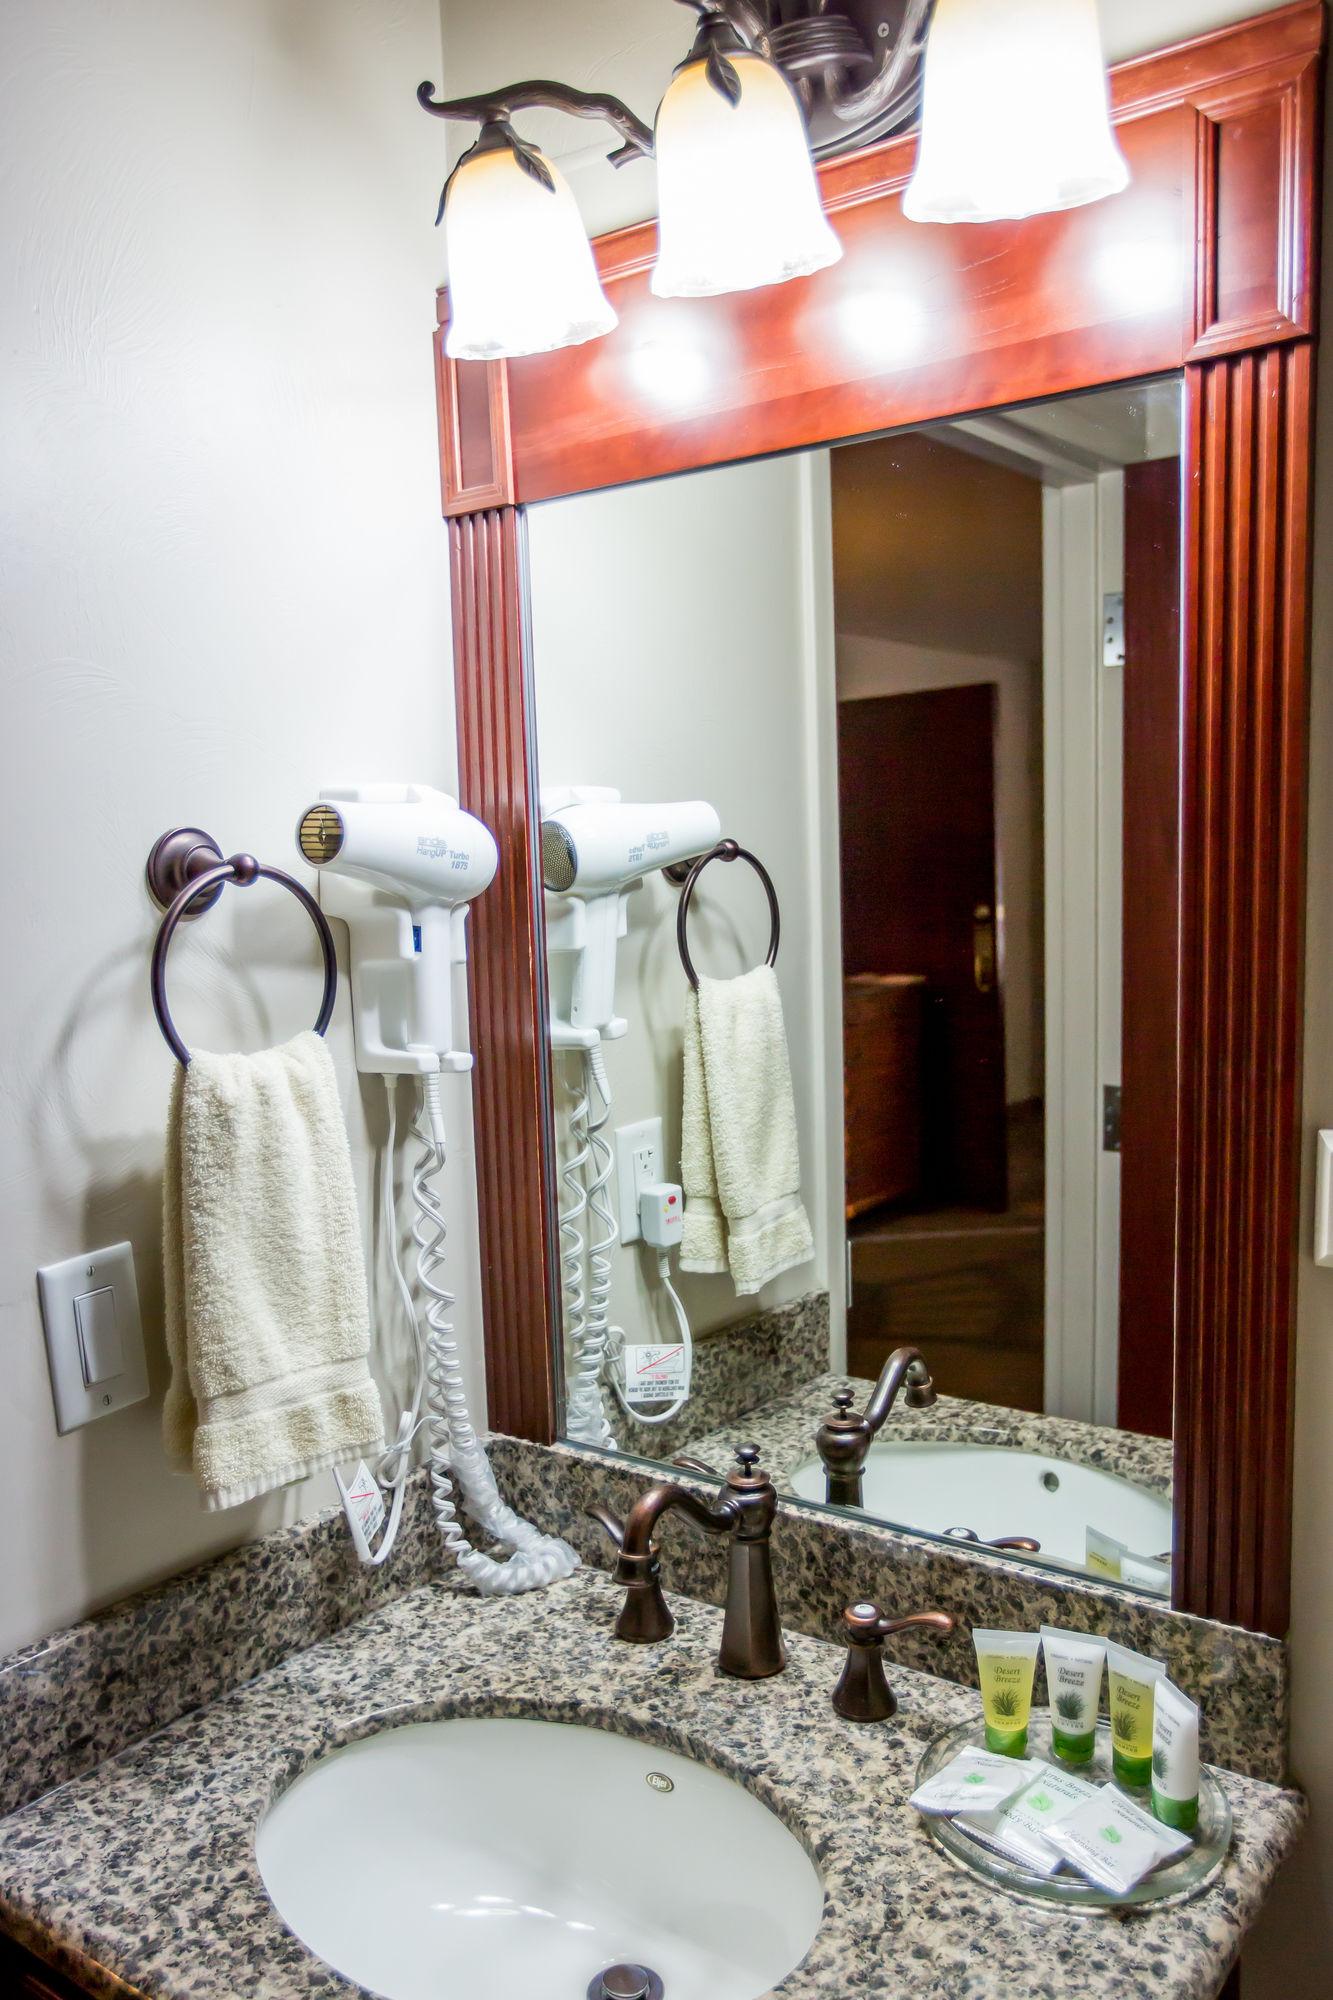 discount coupon for chalet motel in st george utah save. Black Bedroom Furniture Sets. Home Design Ideas